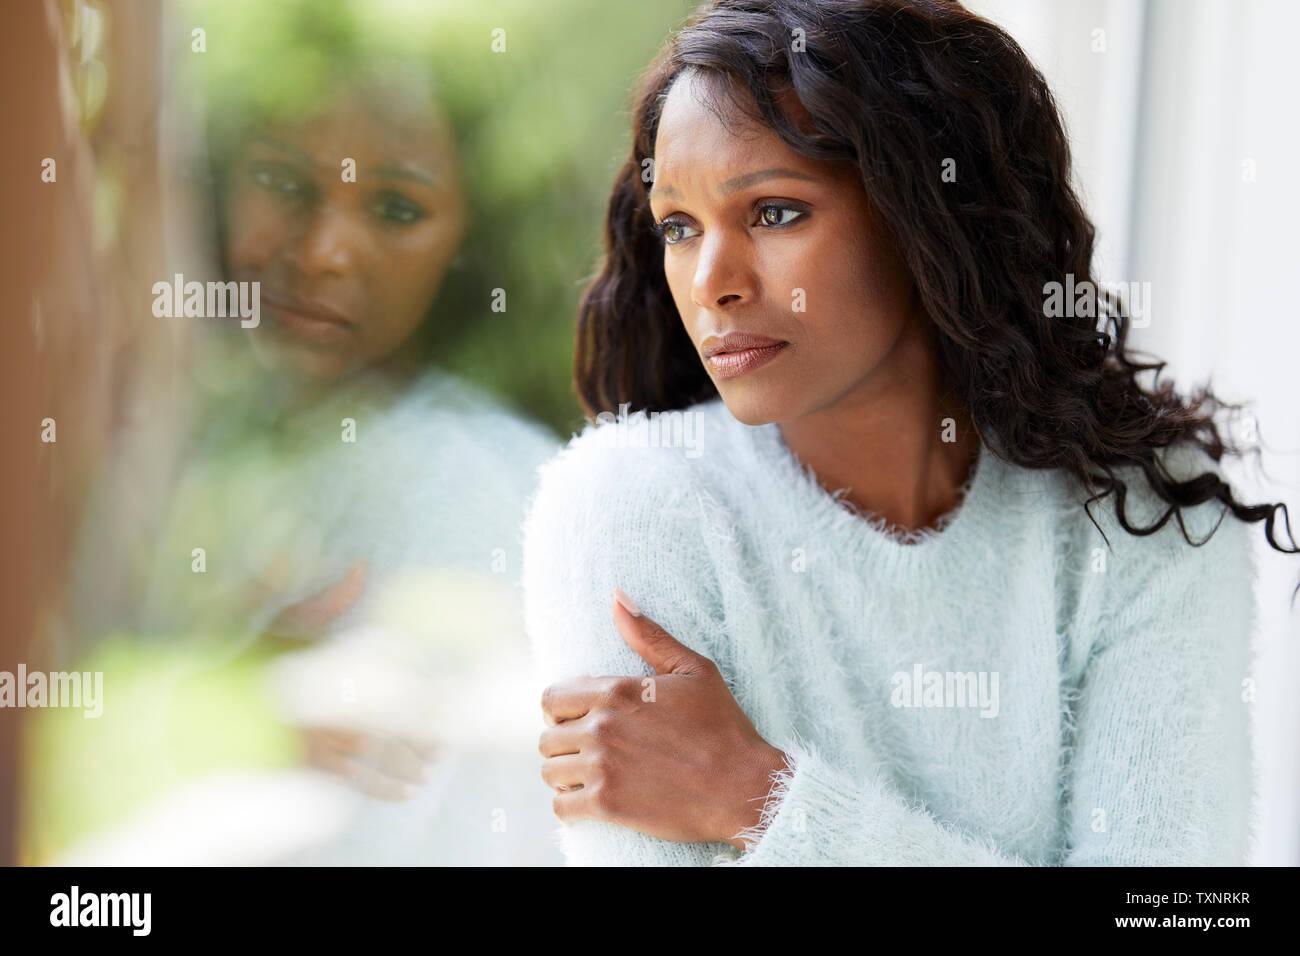 Ethnic woman looking sad sat in a window Stock Photo